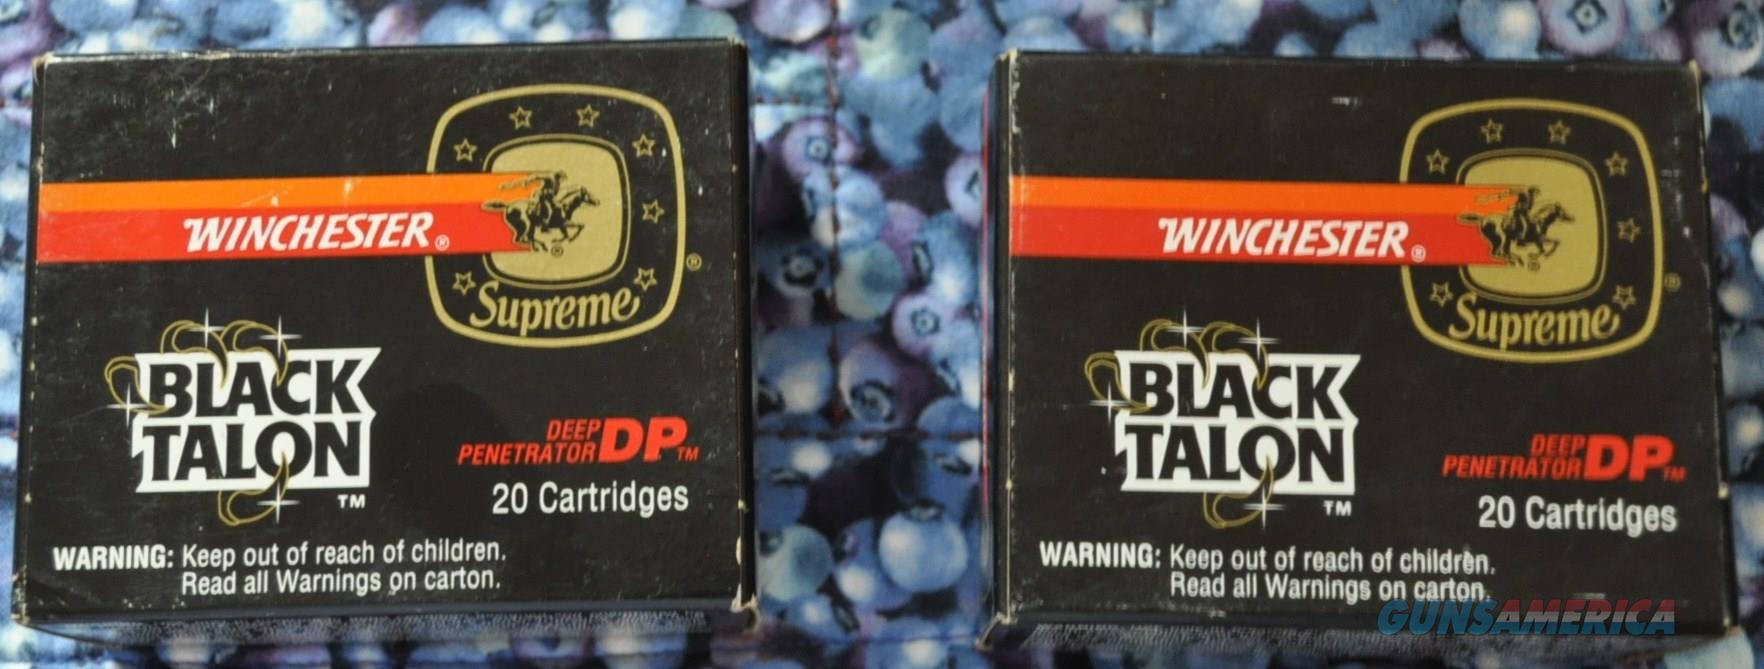 Black Talon Ammo 10mm  Non-Guns > Ammunition